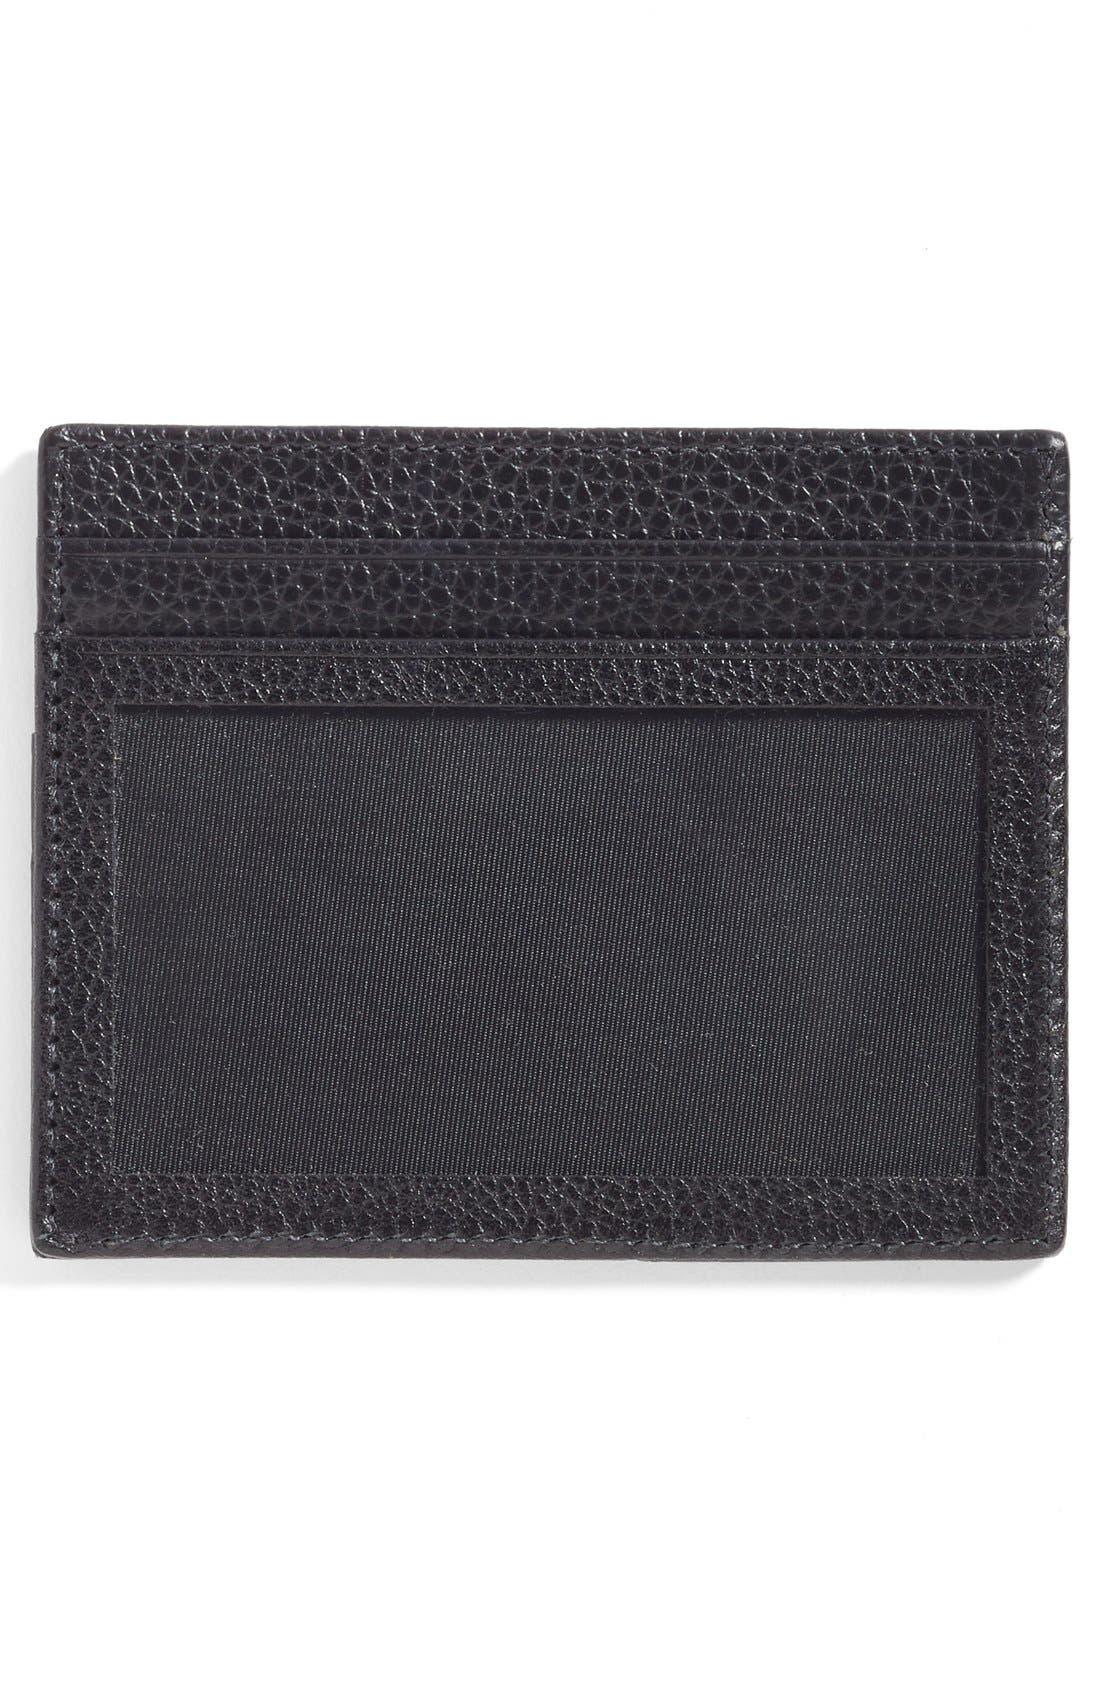 Executive Leather Card Case,                             Alternate thumbnail 7, color,